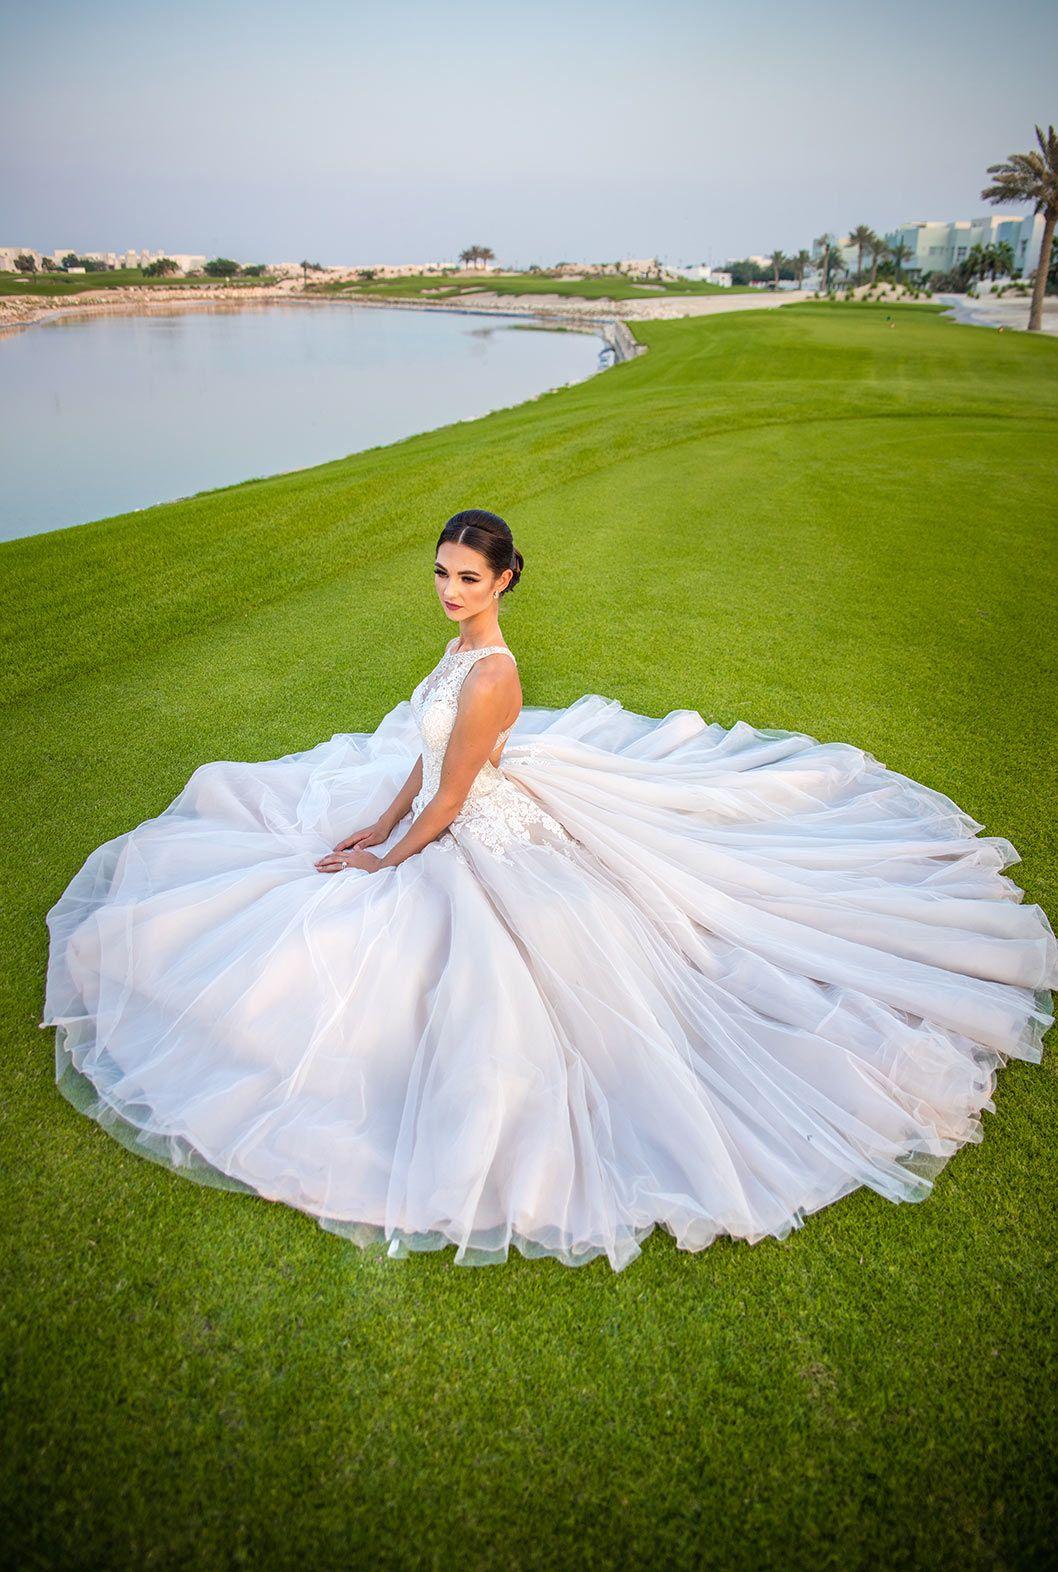 Wedding Nina Mommsen Photographer Bahrain Manama Professional Bride Dress Bride Photographer Wedding Gallery